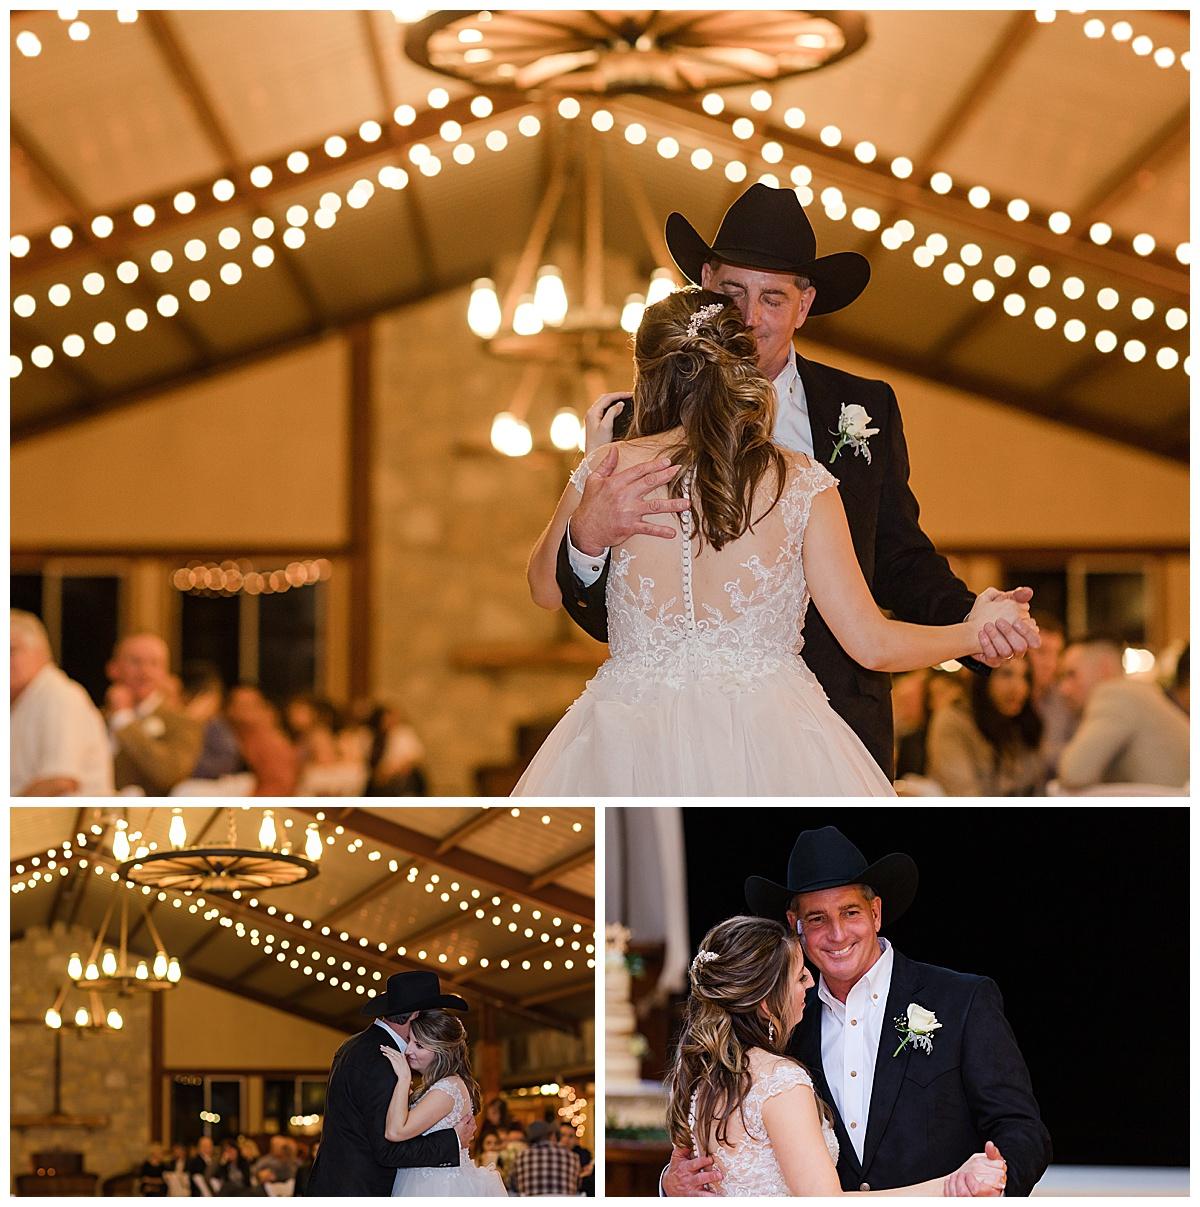 Wedding-Photographer-Texas-Hill-Country-Happy-H-Ranch-Comfor-Texas-Carly-Barton-Photography_0074.jpg